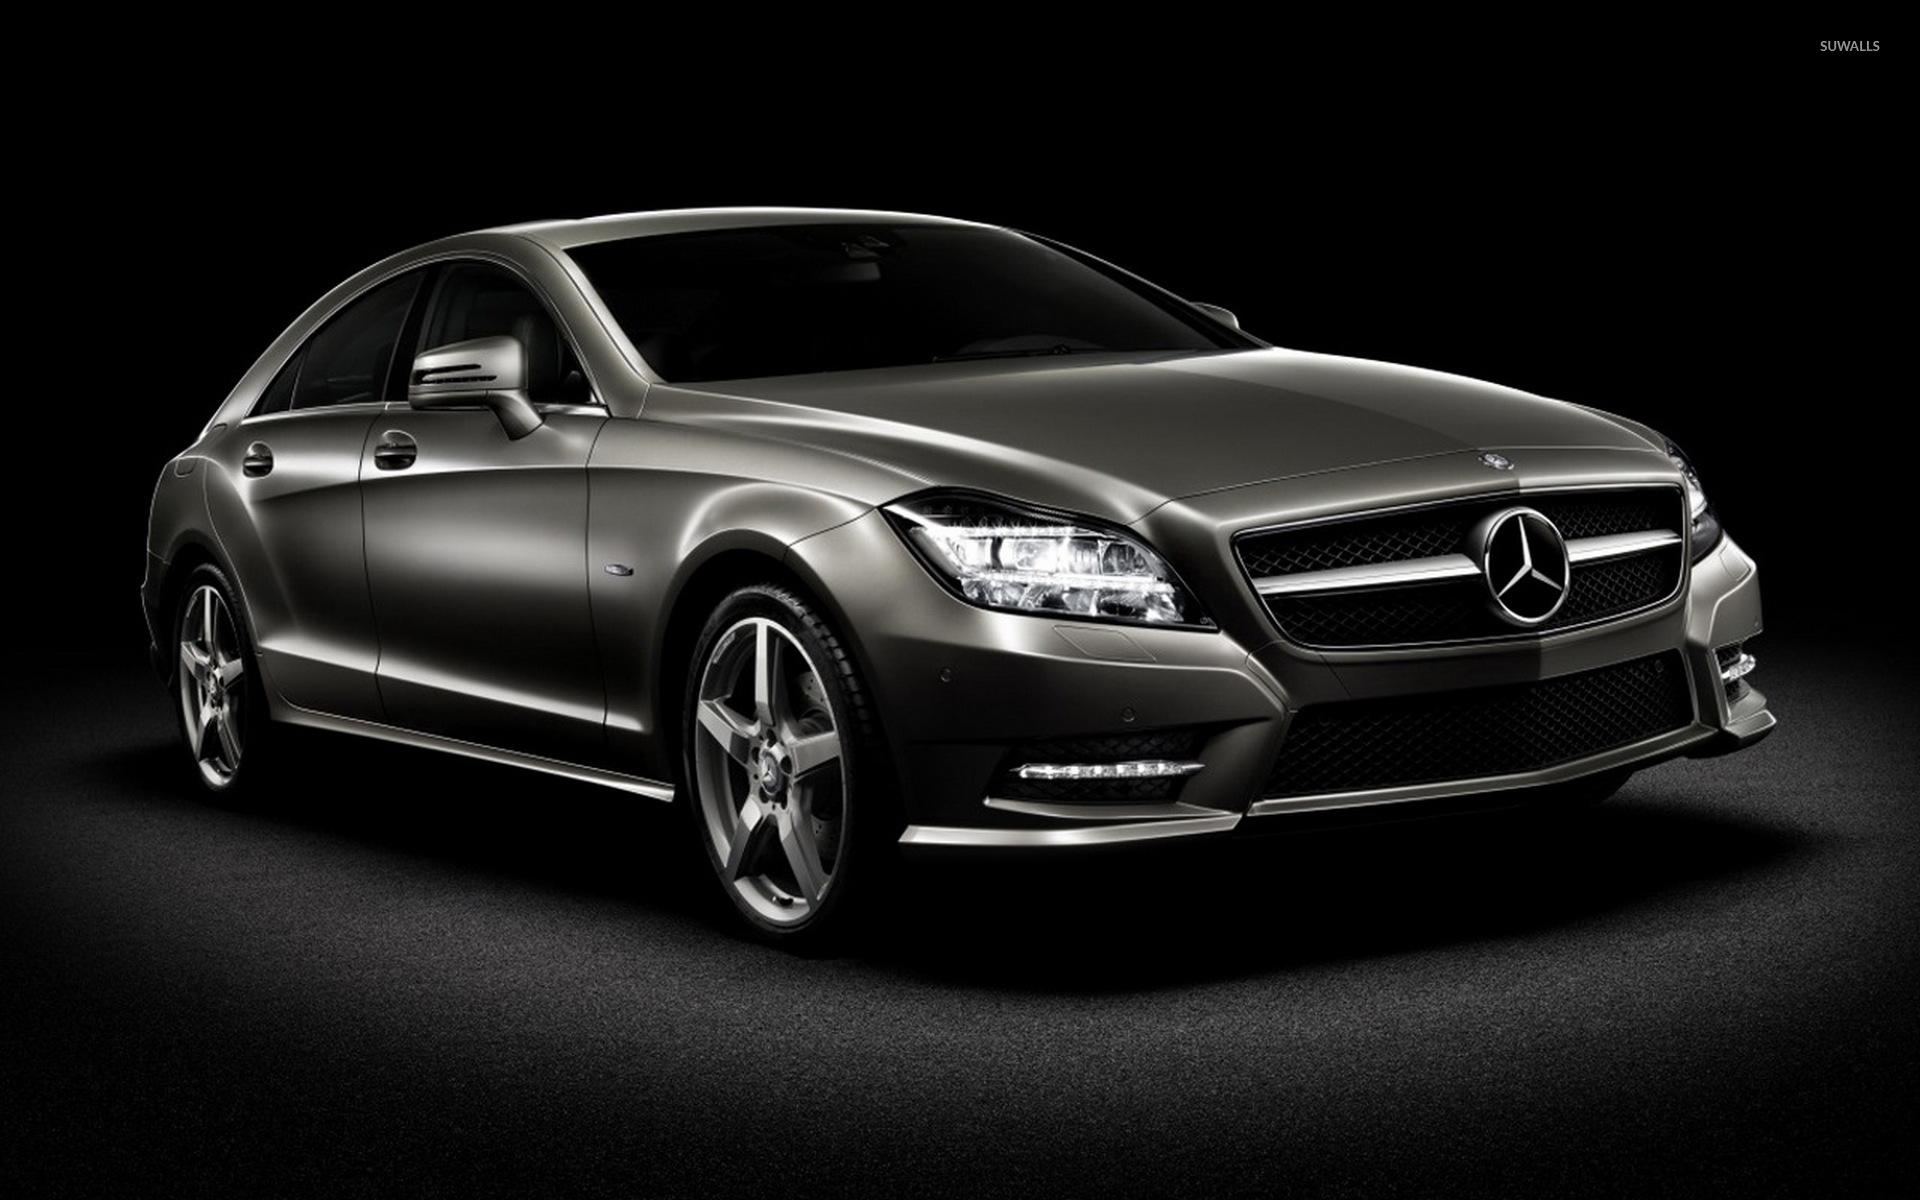 Wallpapers Cars Mercedes Benz Ocean Drive Concept Wallpaper World